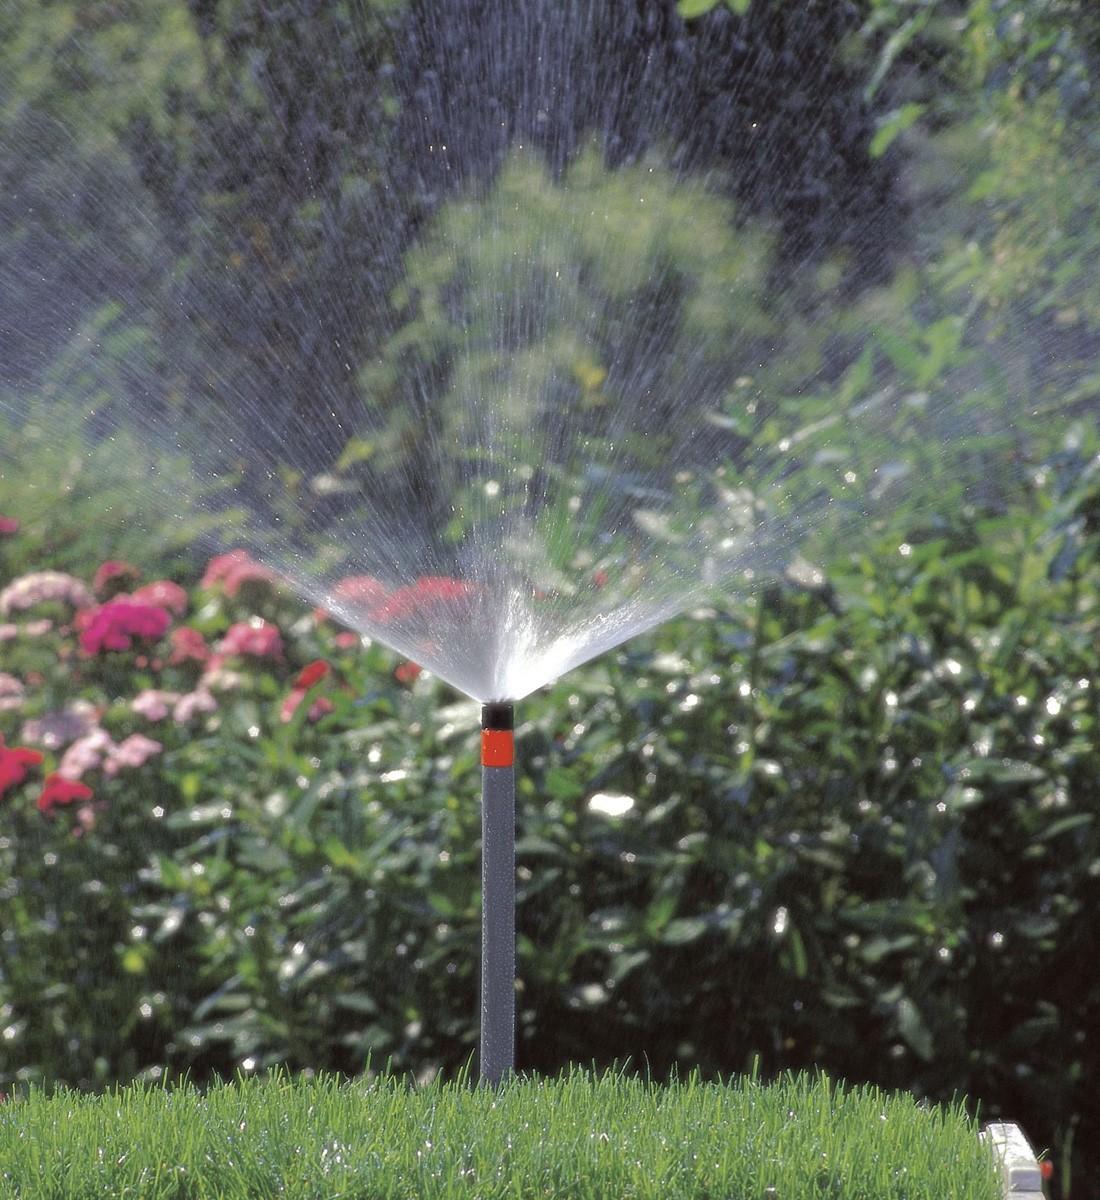 Pop-up Sprinkler S 80/300